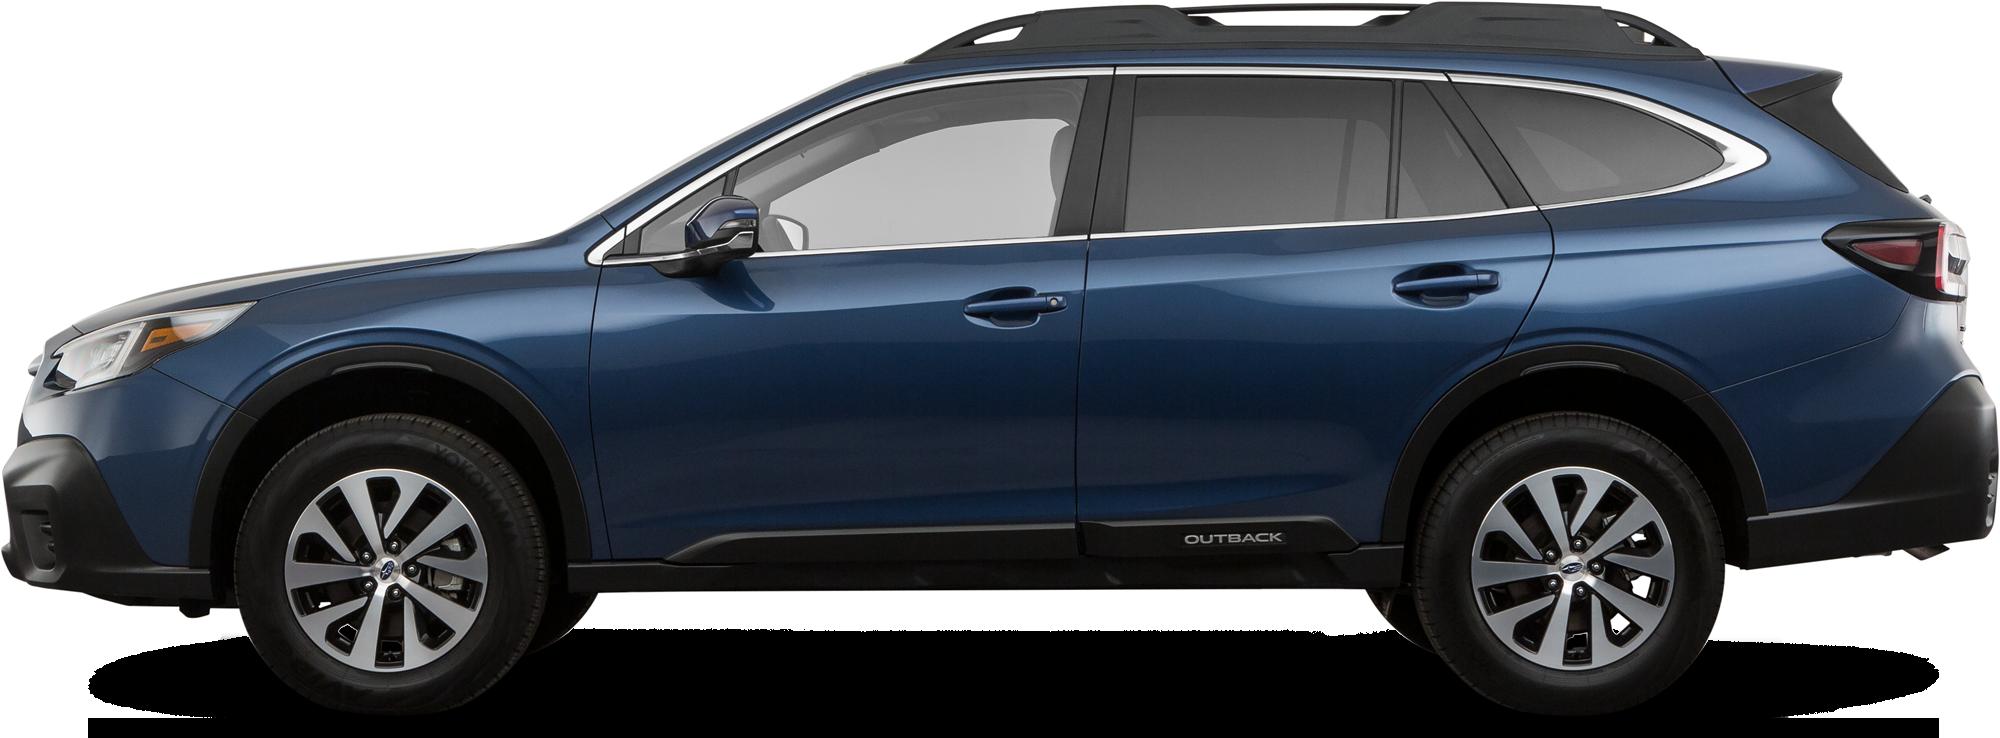 2021 Subaru Outback SUV Premium